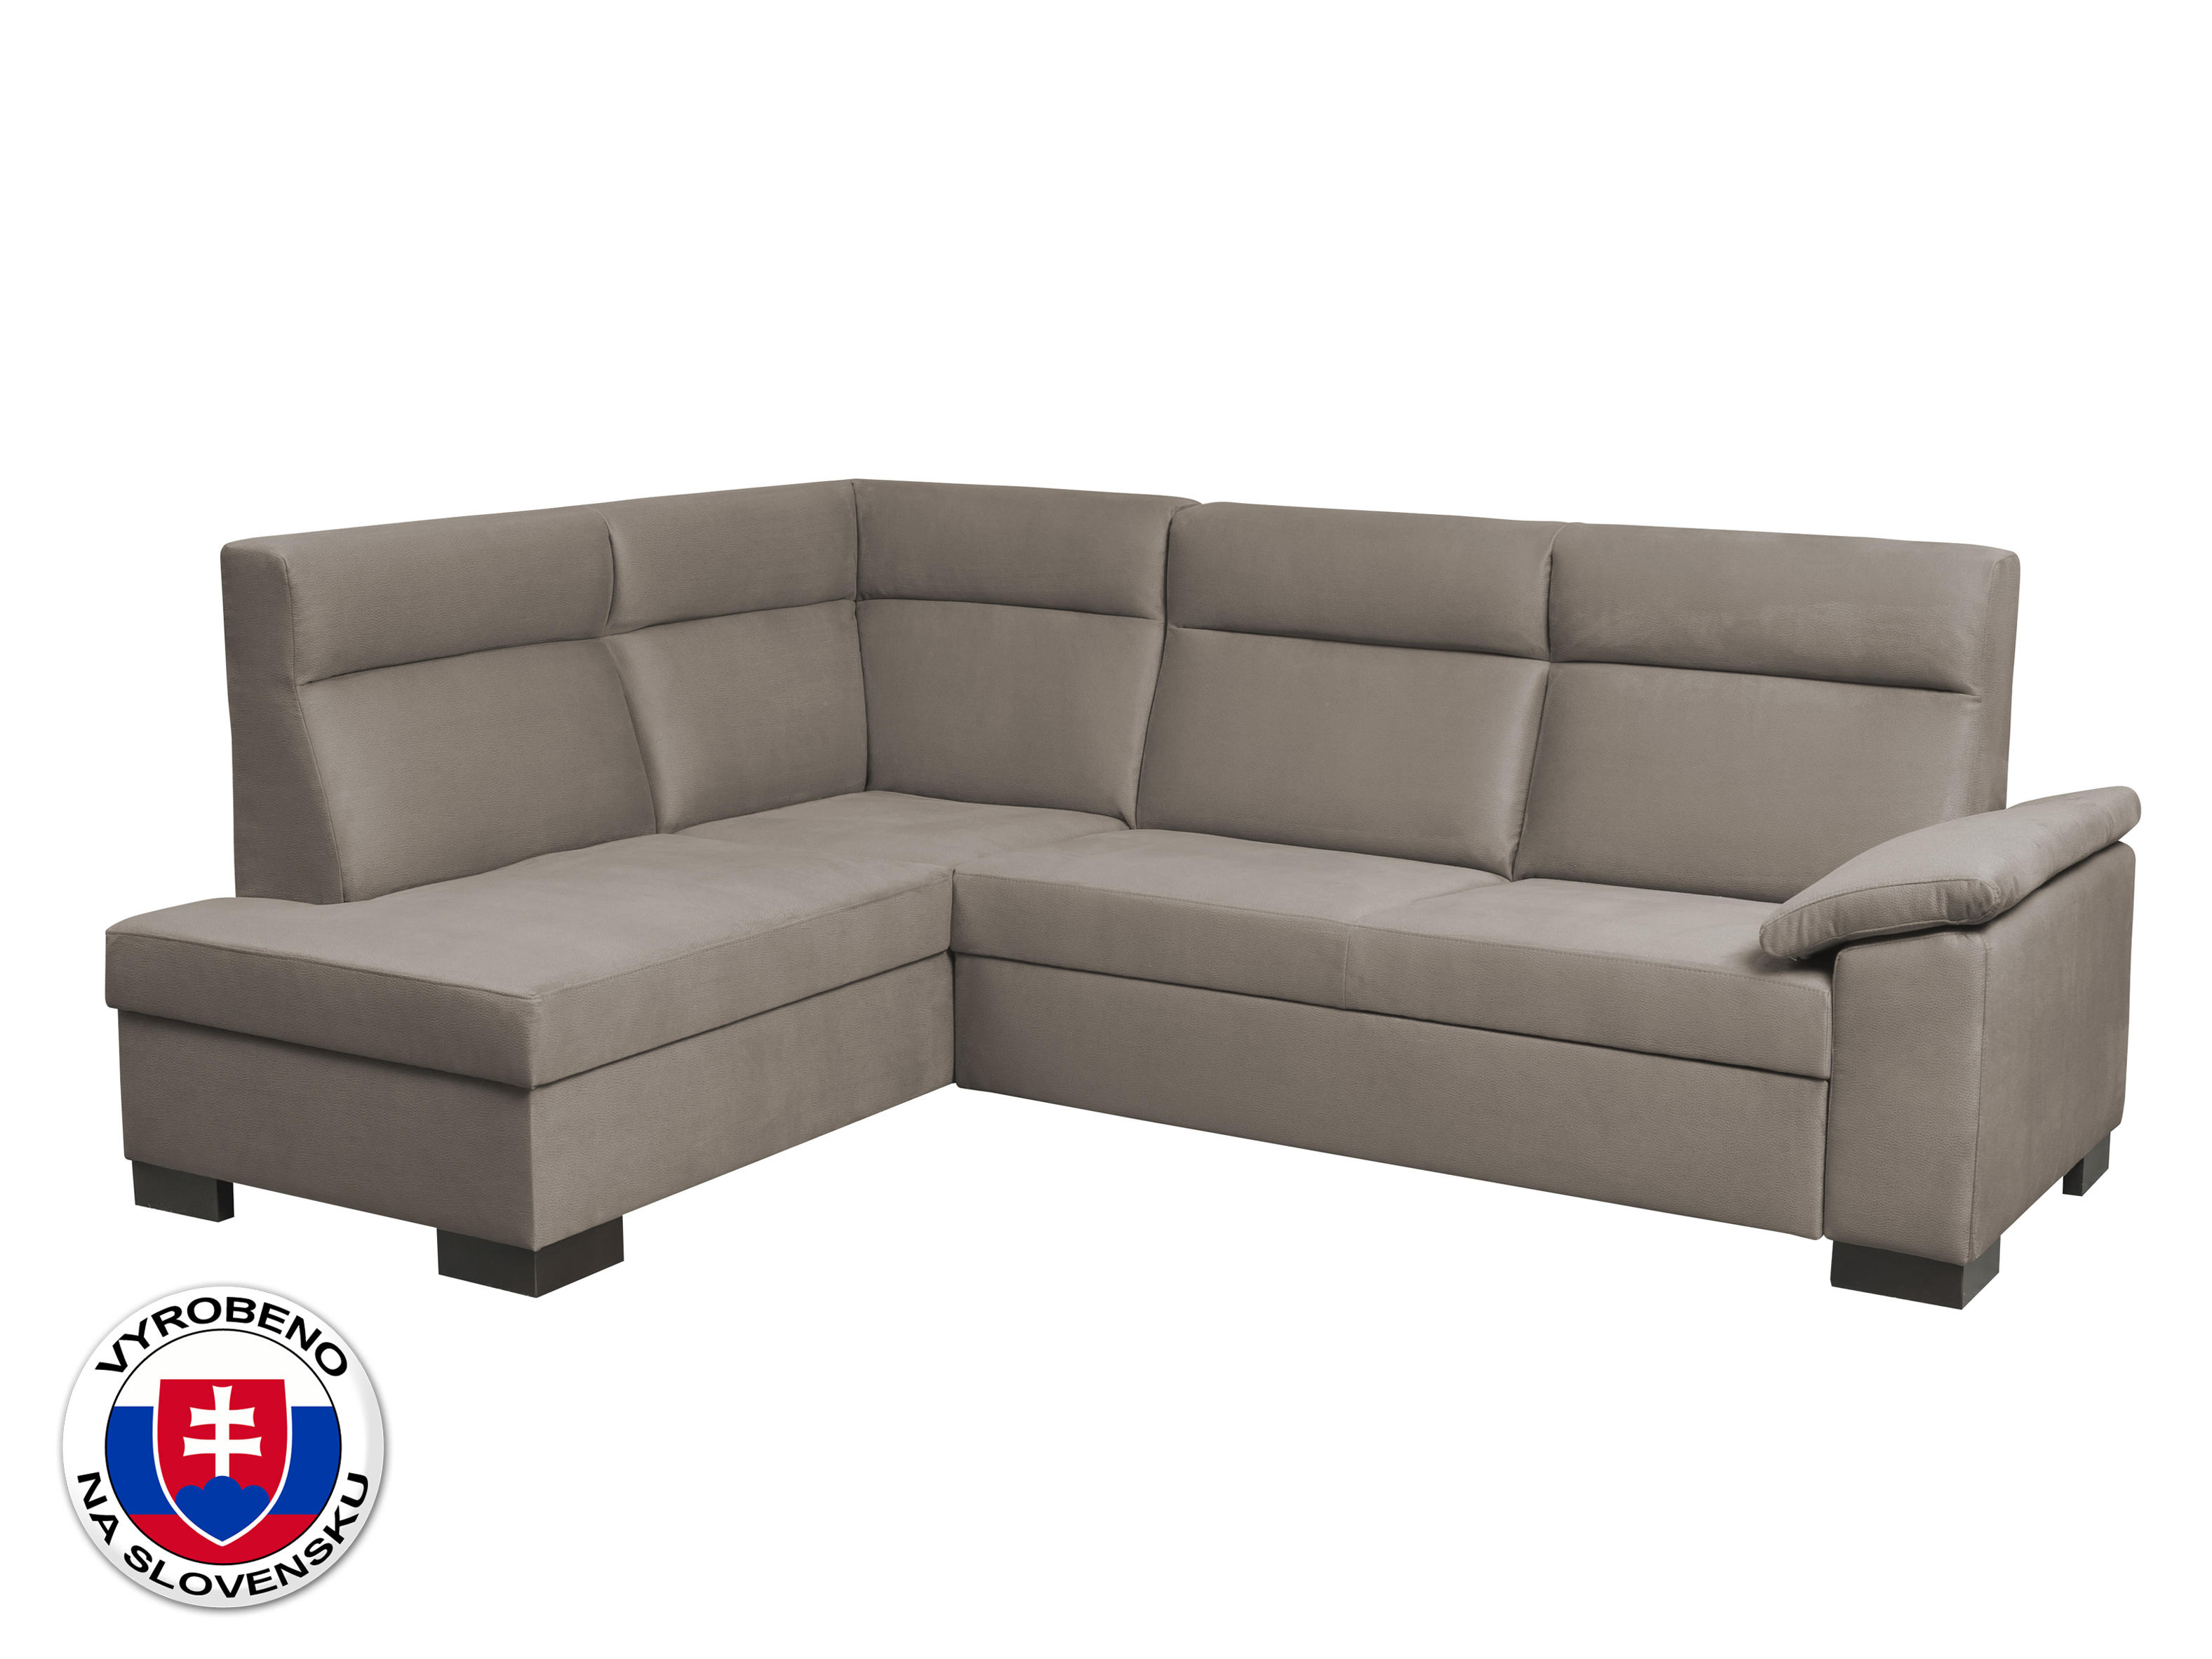 Rohová sedací souprava - BRW - San Remo Područka A (hnědá) (L) *dárek ZDARMA